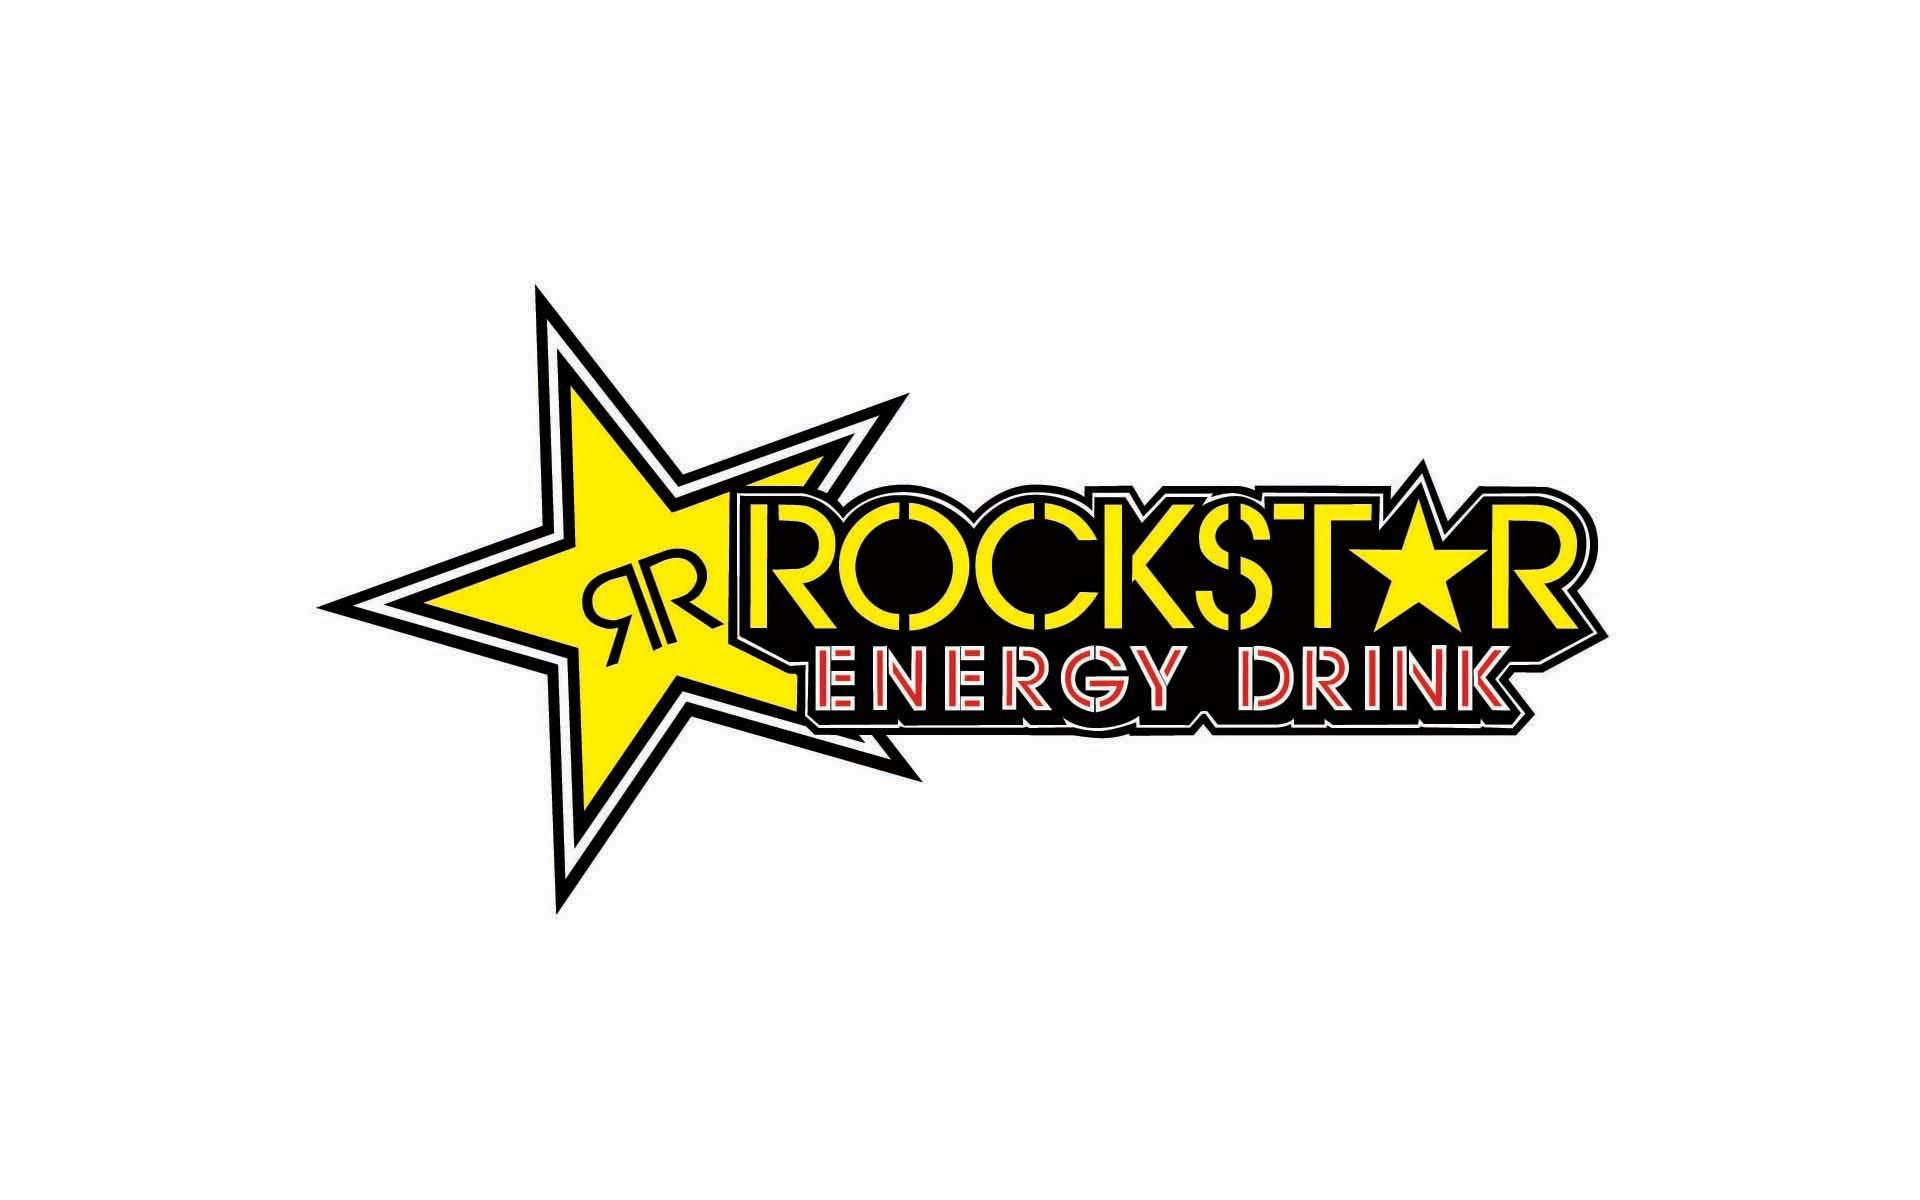 Download rockstar energy drink logo